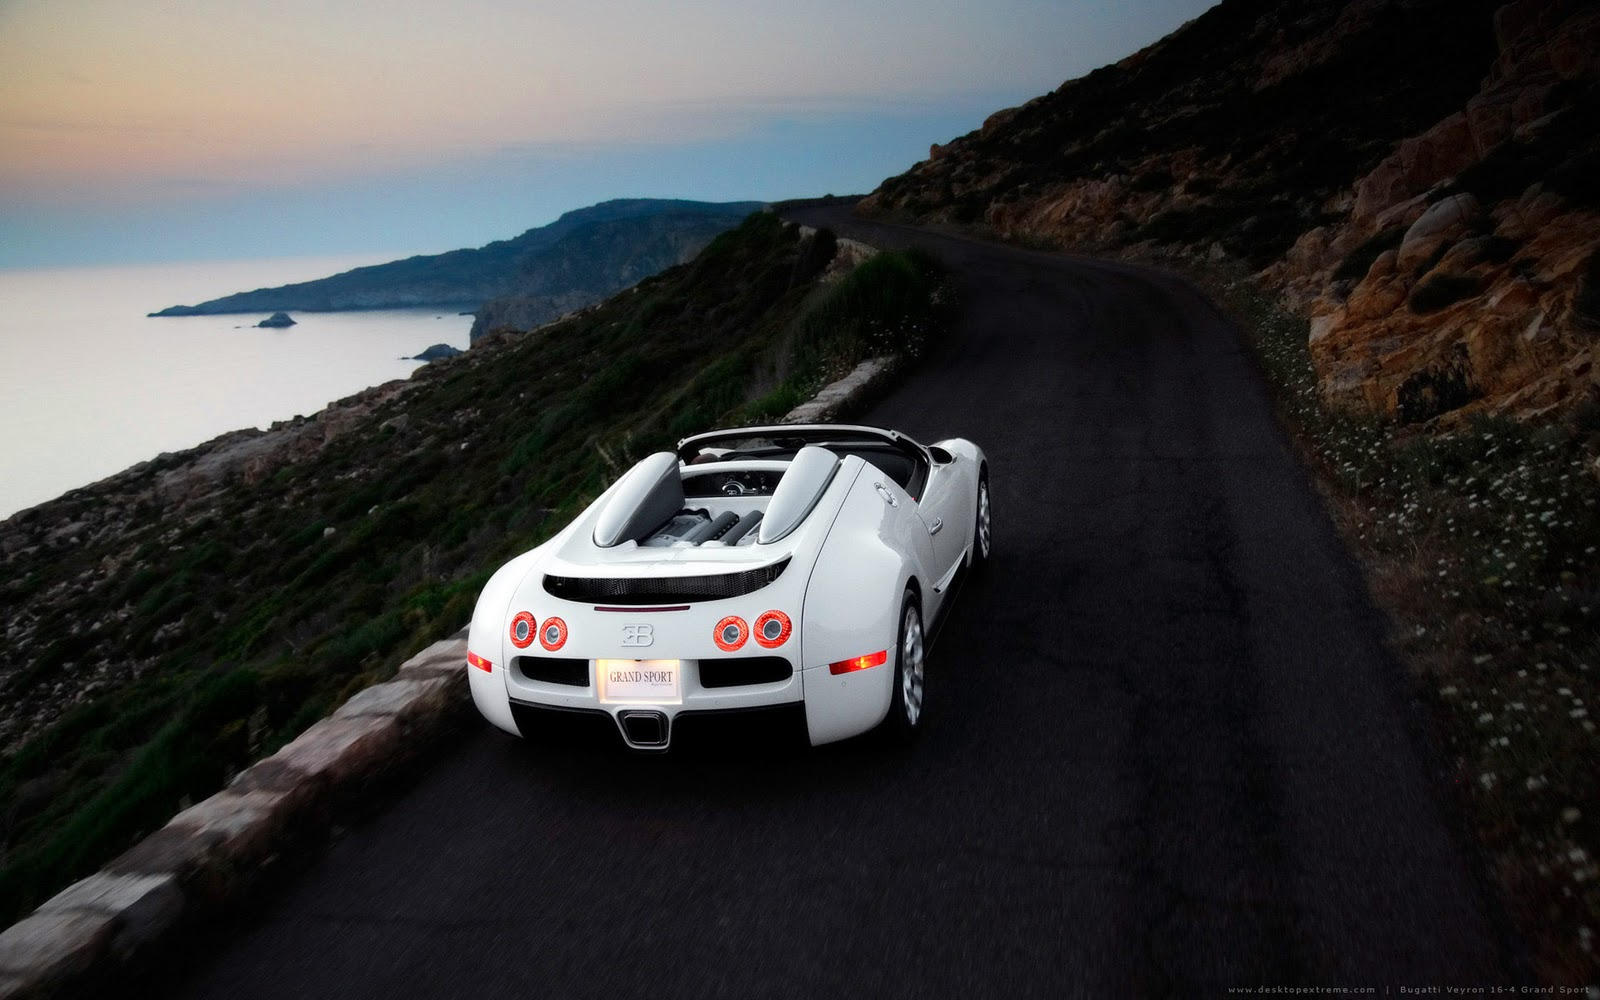 Bugatti full hd hdtv fhd p wallpapers hd desktop backgrounds